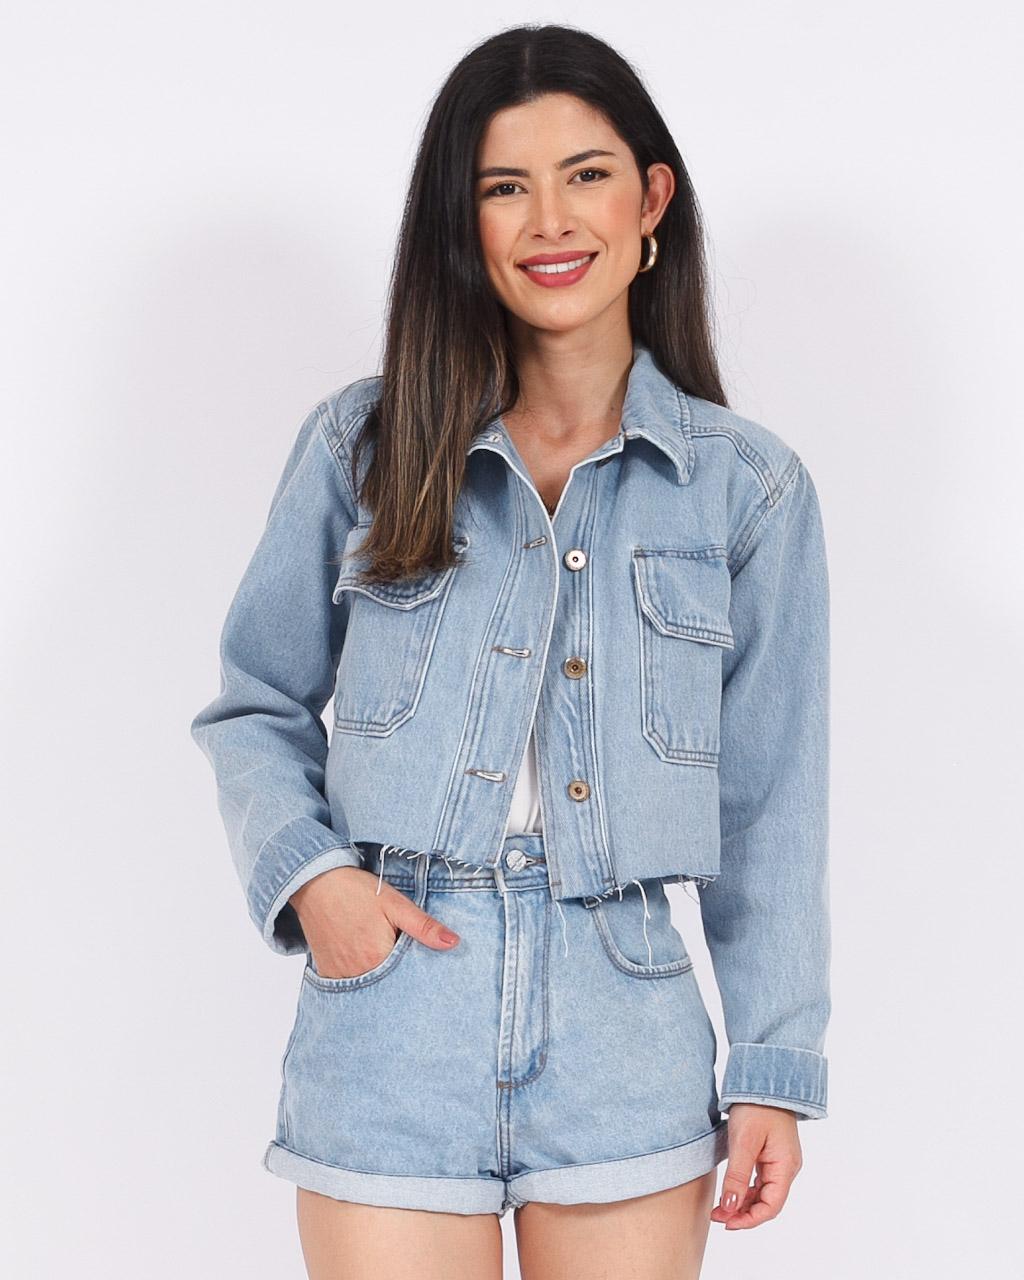 Jaqueta Jeans Cropped Bolso Chanfrado